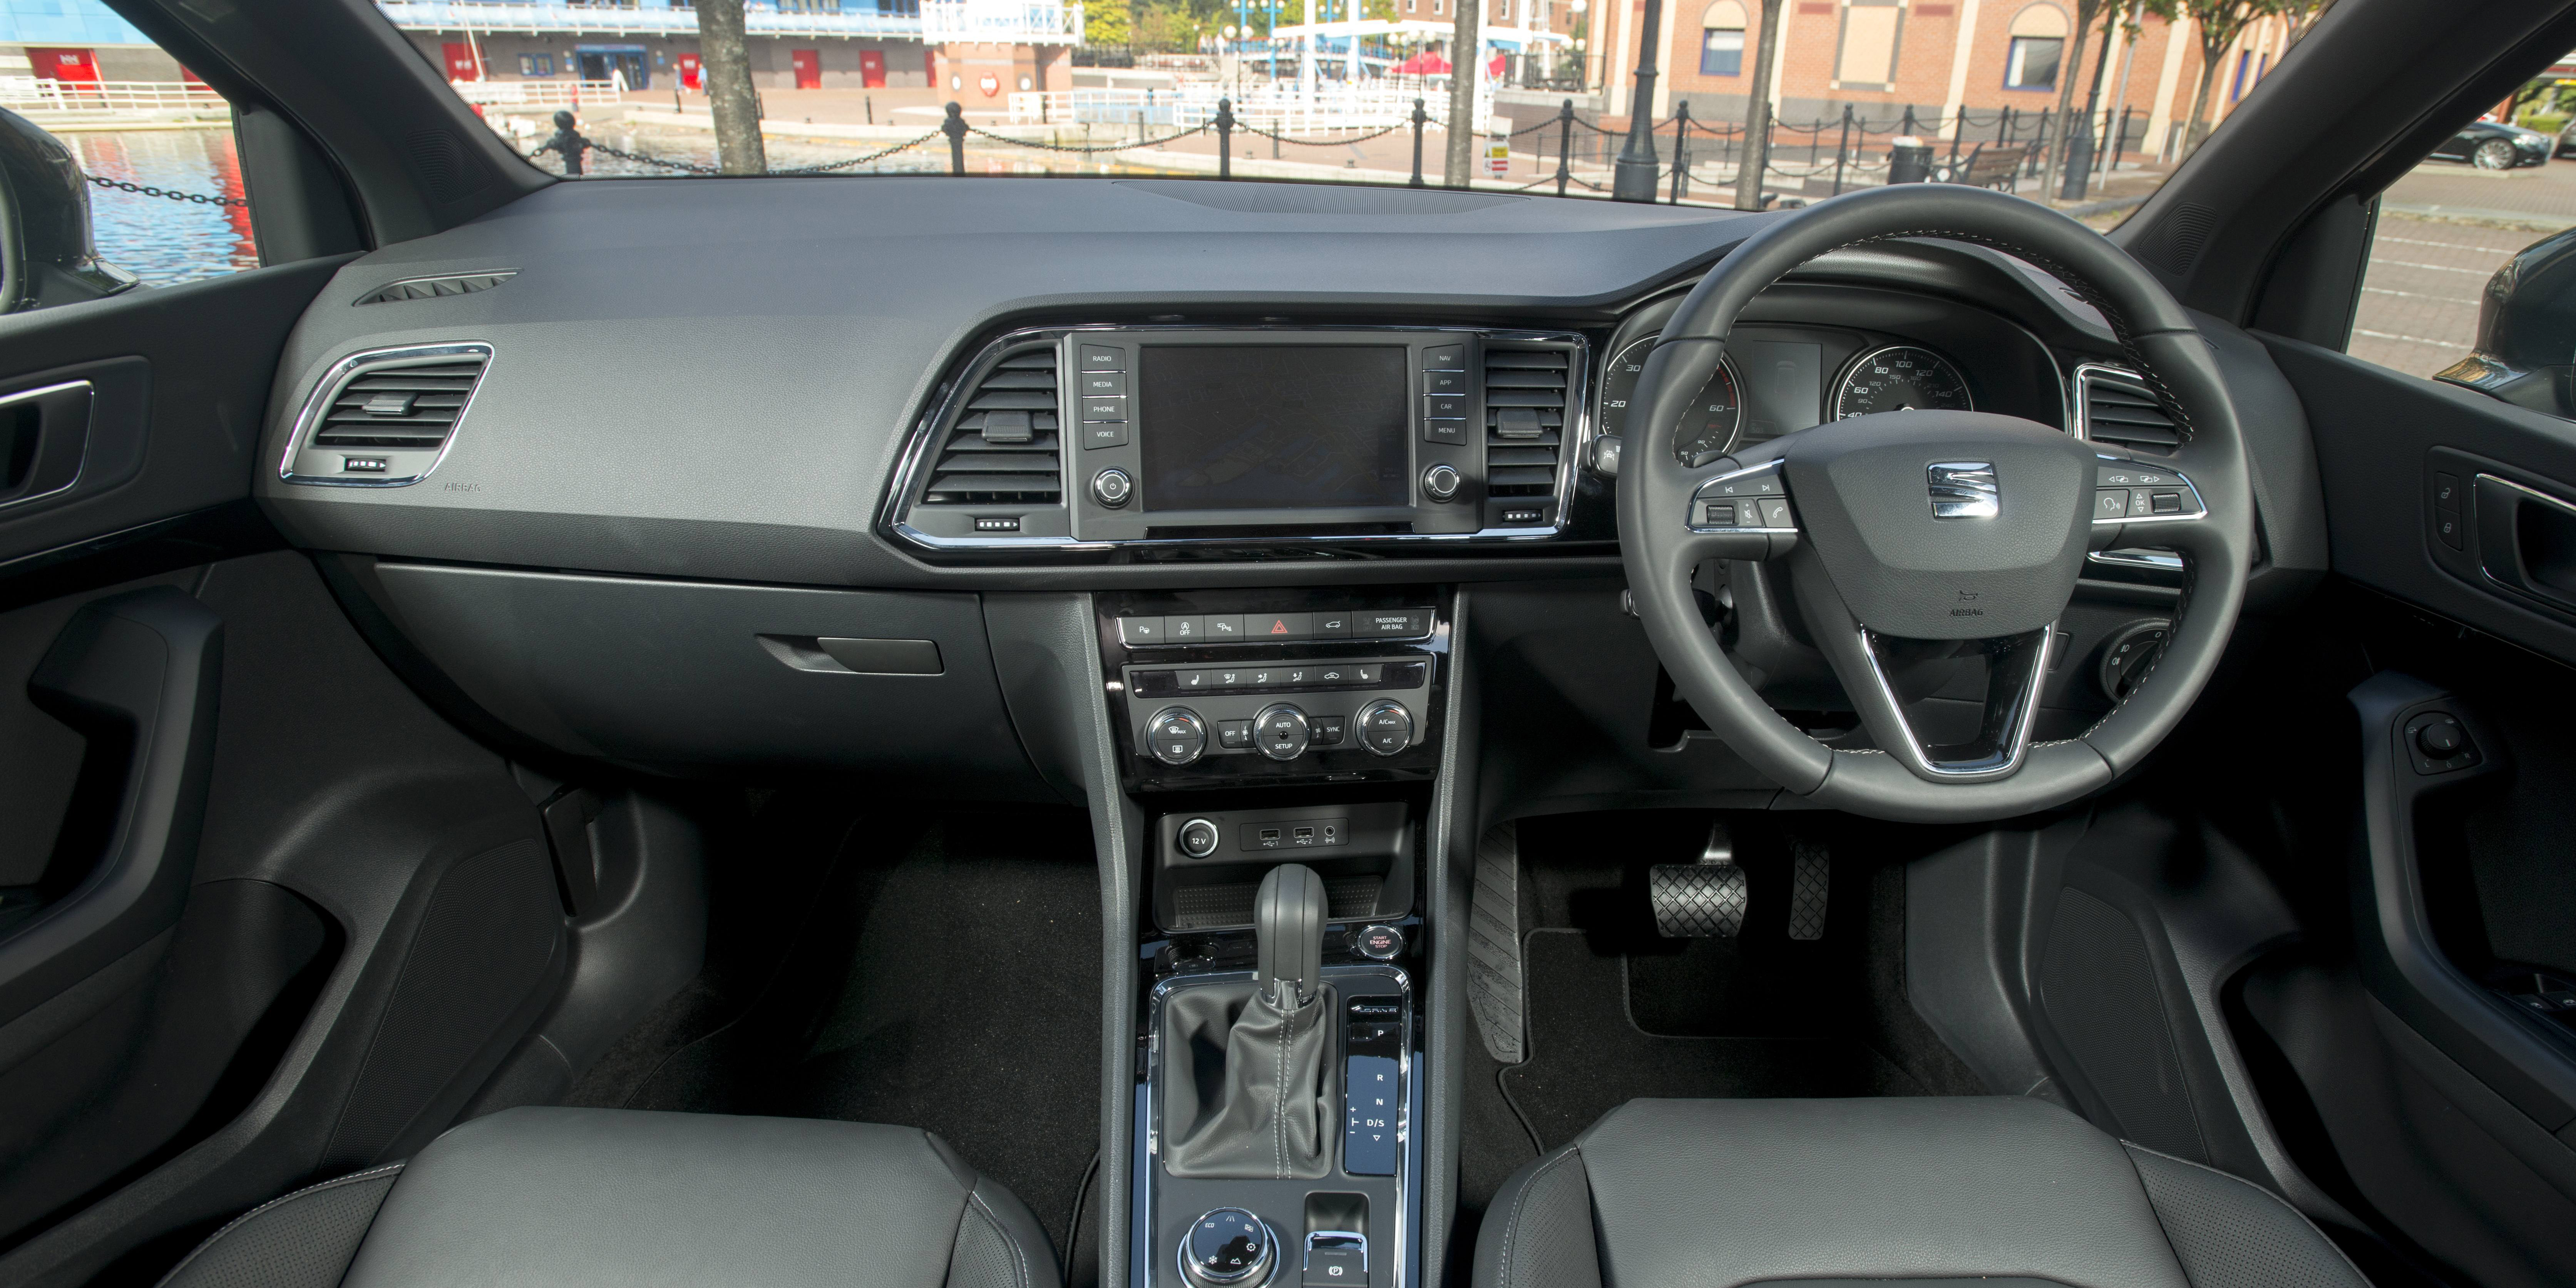 SEAT Ateca Interior & Infotainment | carwow